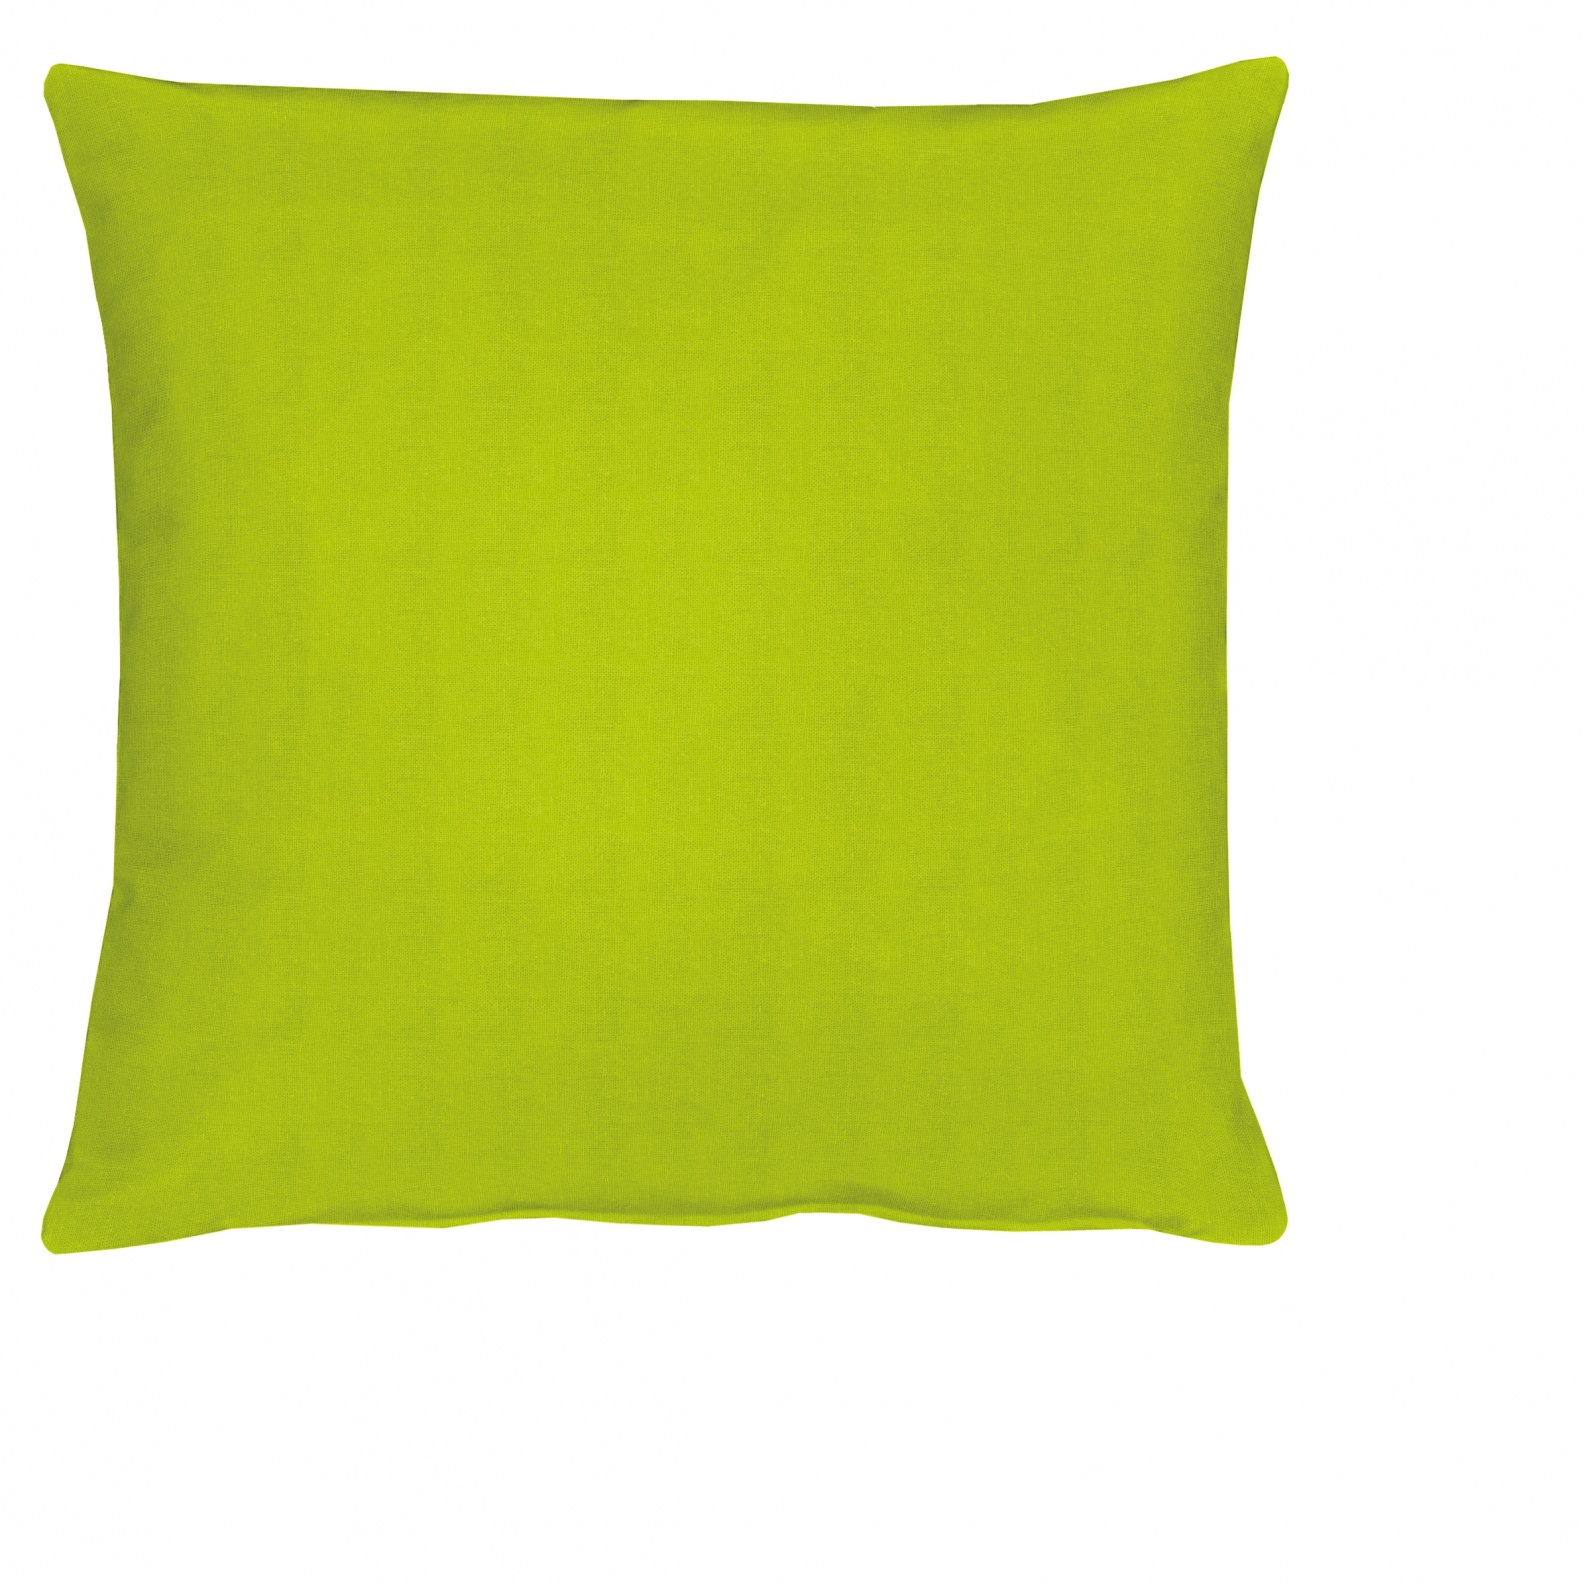 Tosca Col 40 40x40 Cushion Myhome Pr 233 Mium B 250 Tor